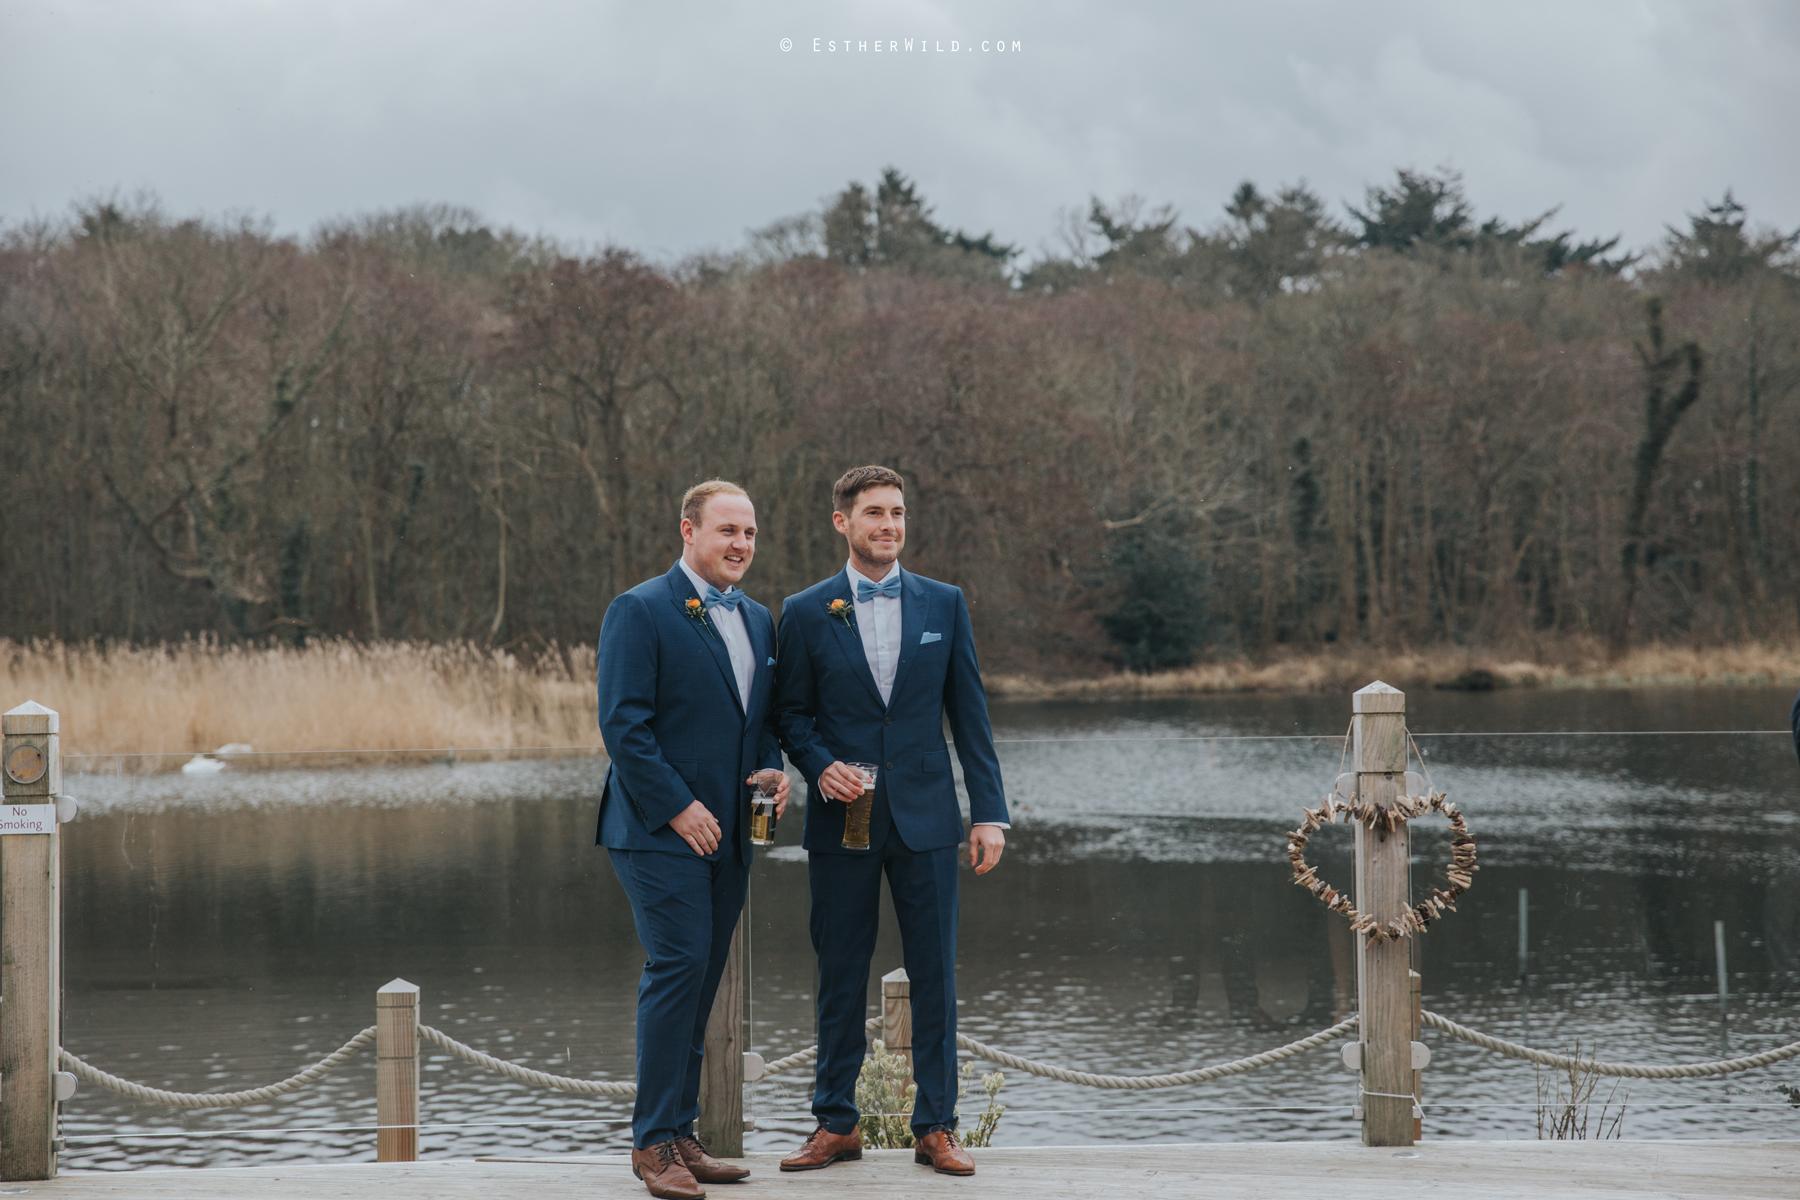 The_BoatHouse_Wedding_Venue_Ormesby_Norfolk_Broads_Boat_Wedding_Photography_Esther_Wild_Photographer_IMG_0874.jpg